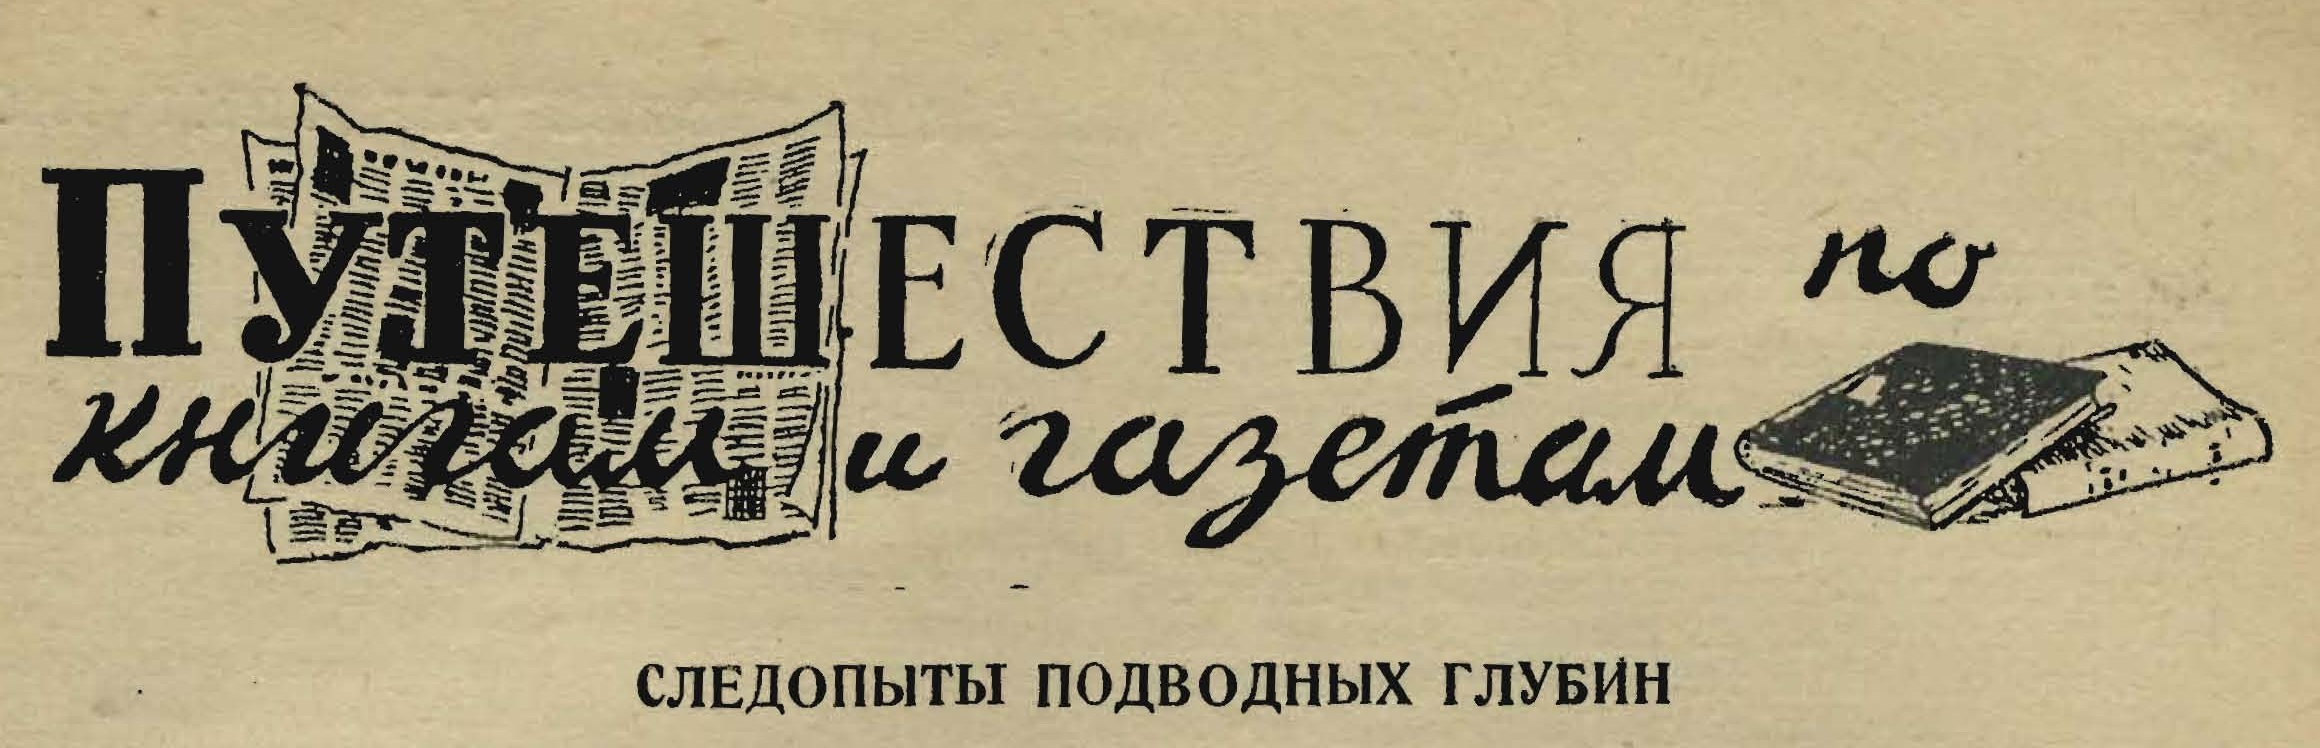 67 путешествия по книгам и газетам 67 (1)